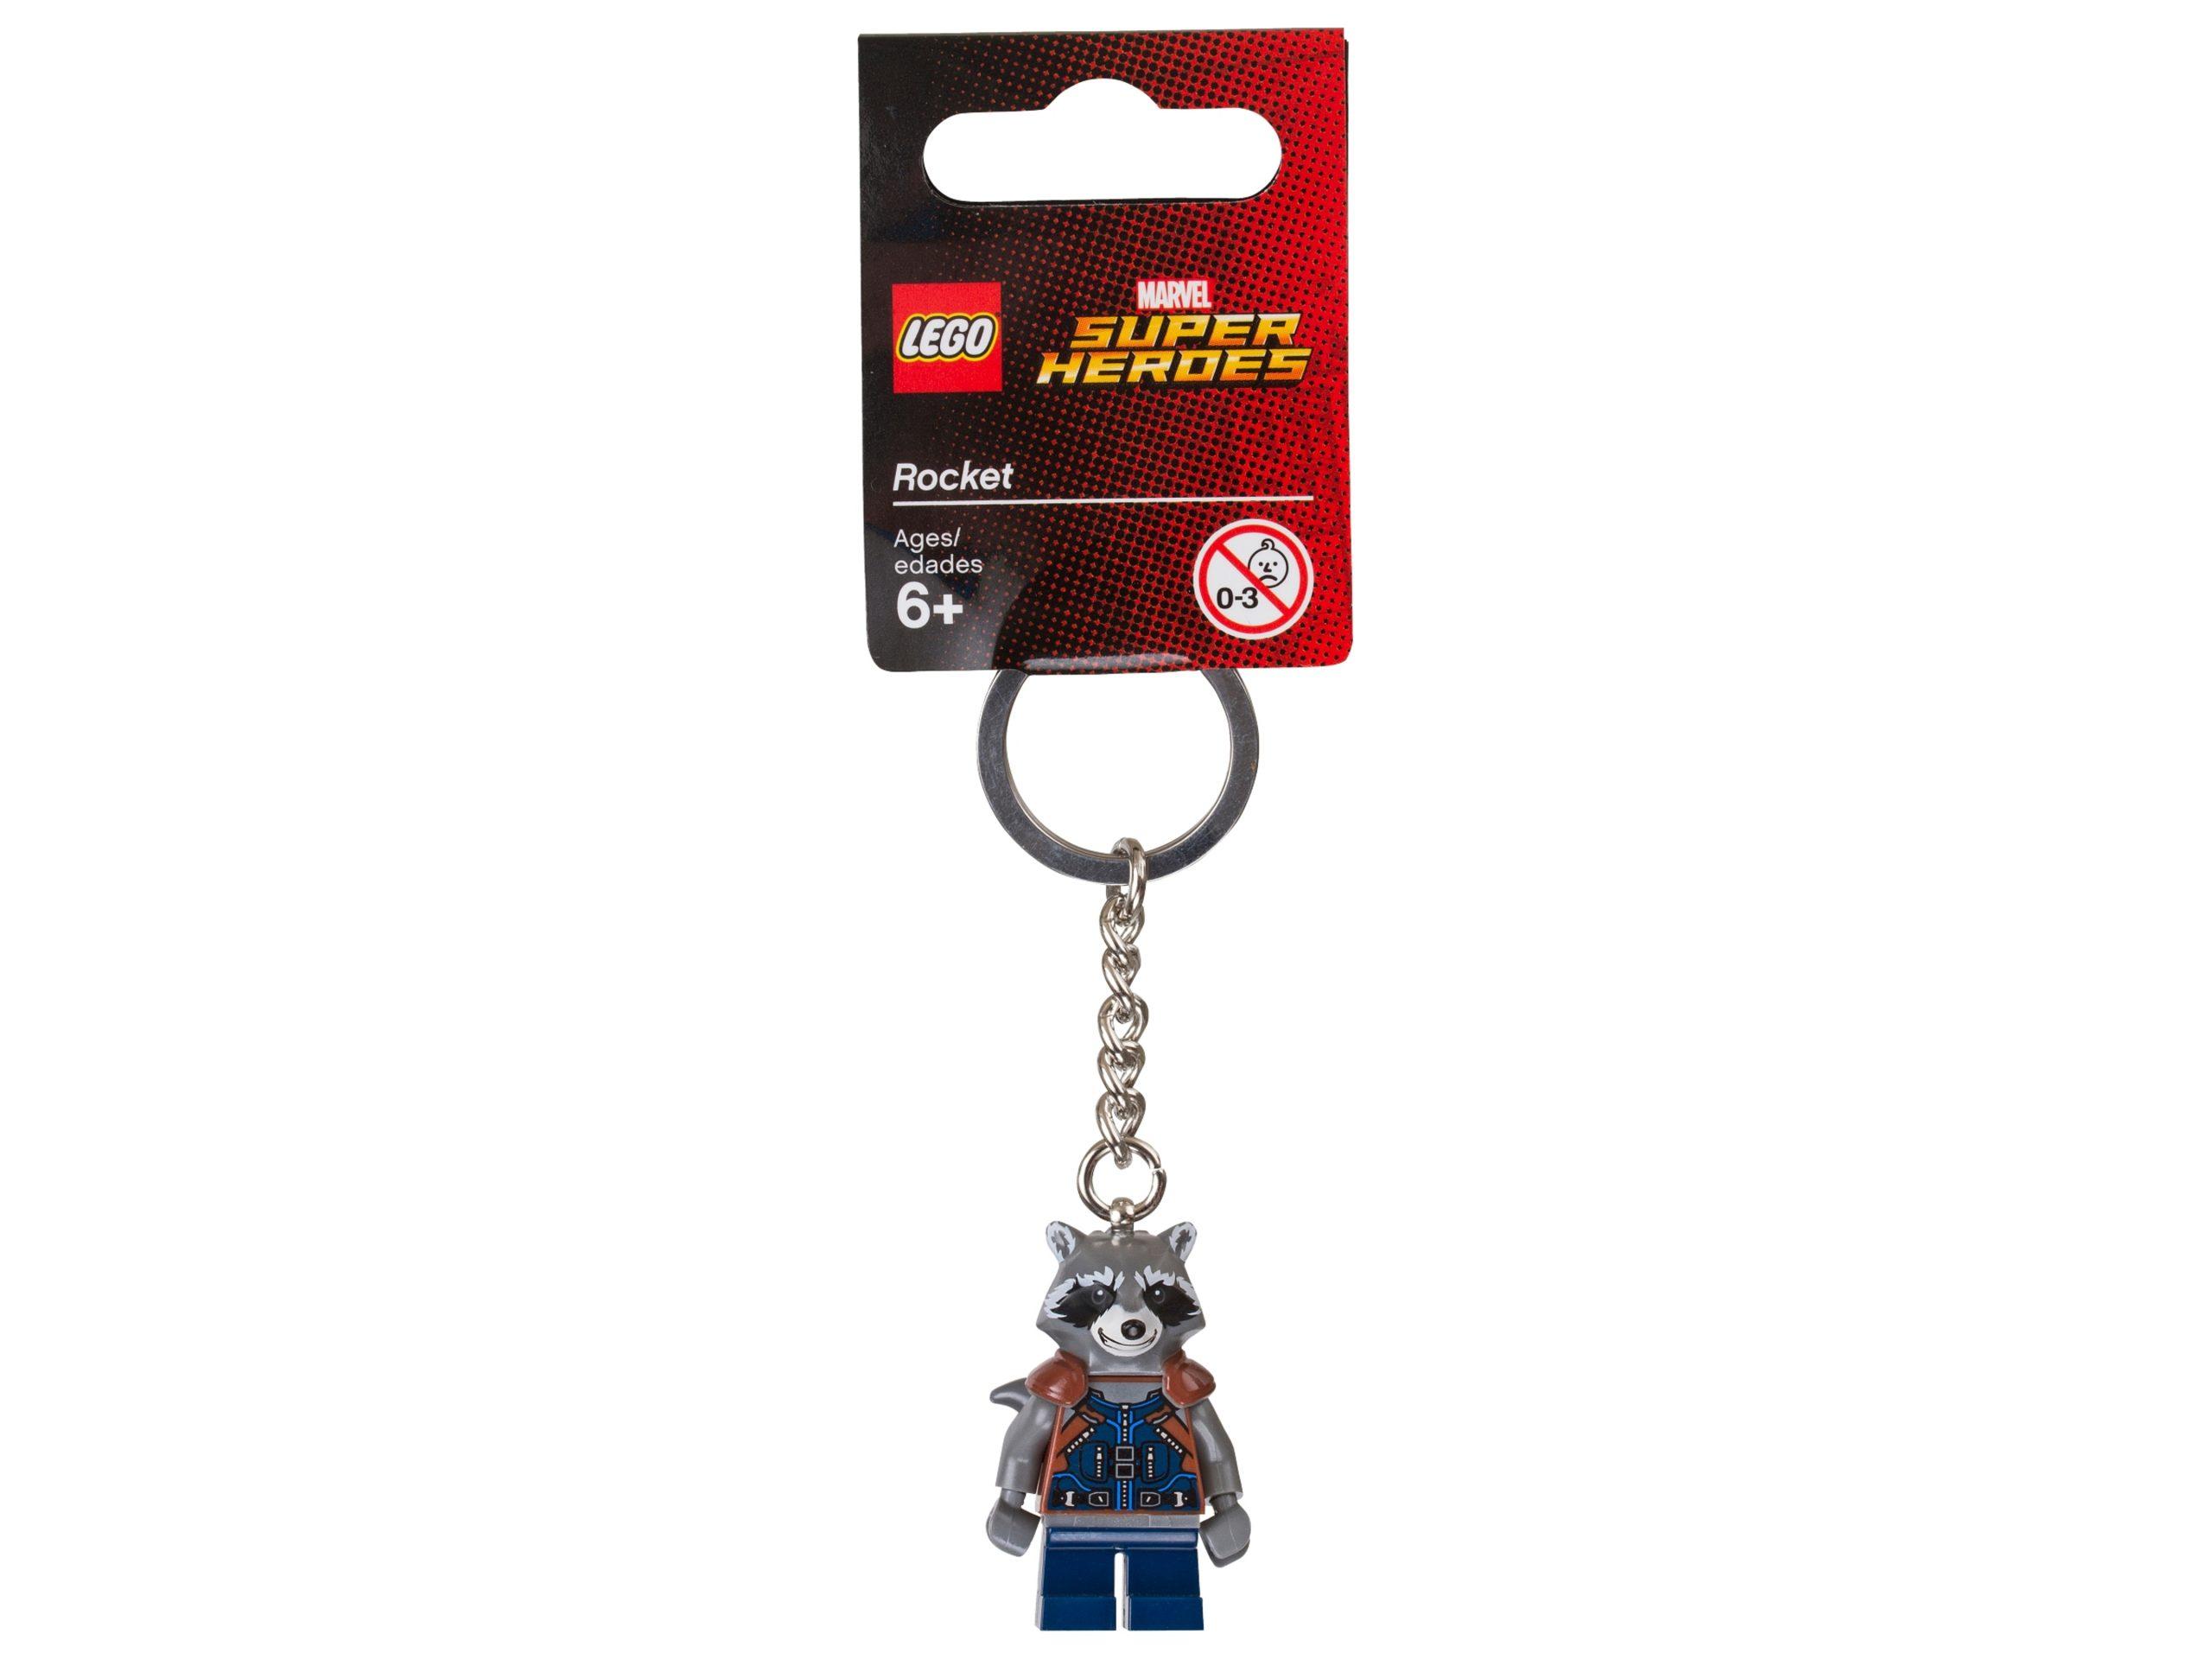 lego 853708 marvel super heroes rocket key chain scaled